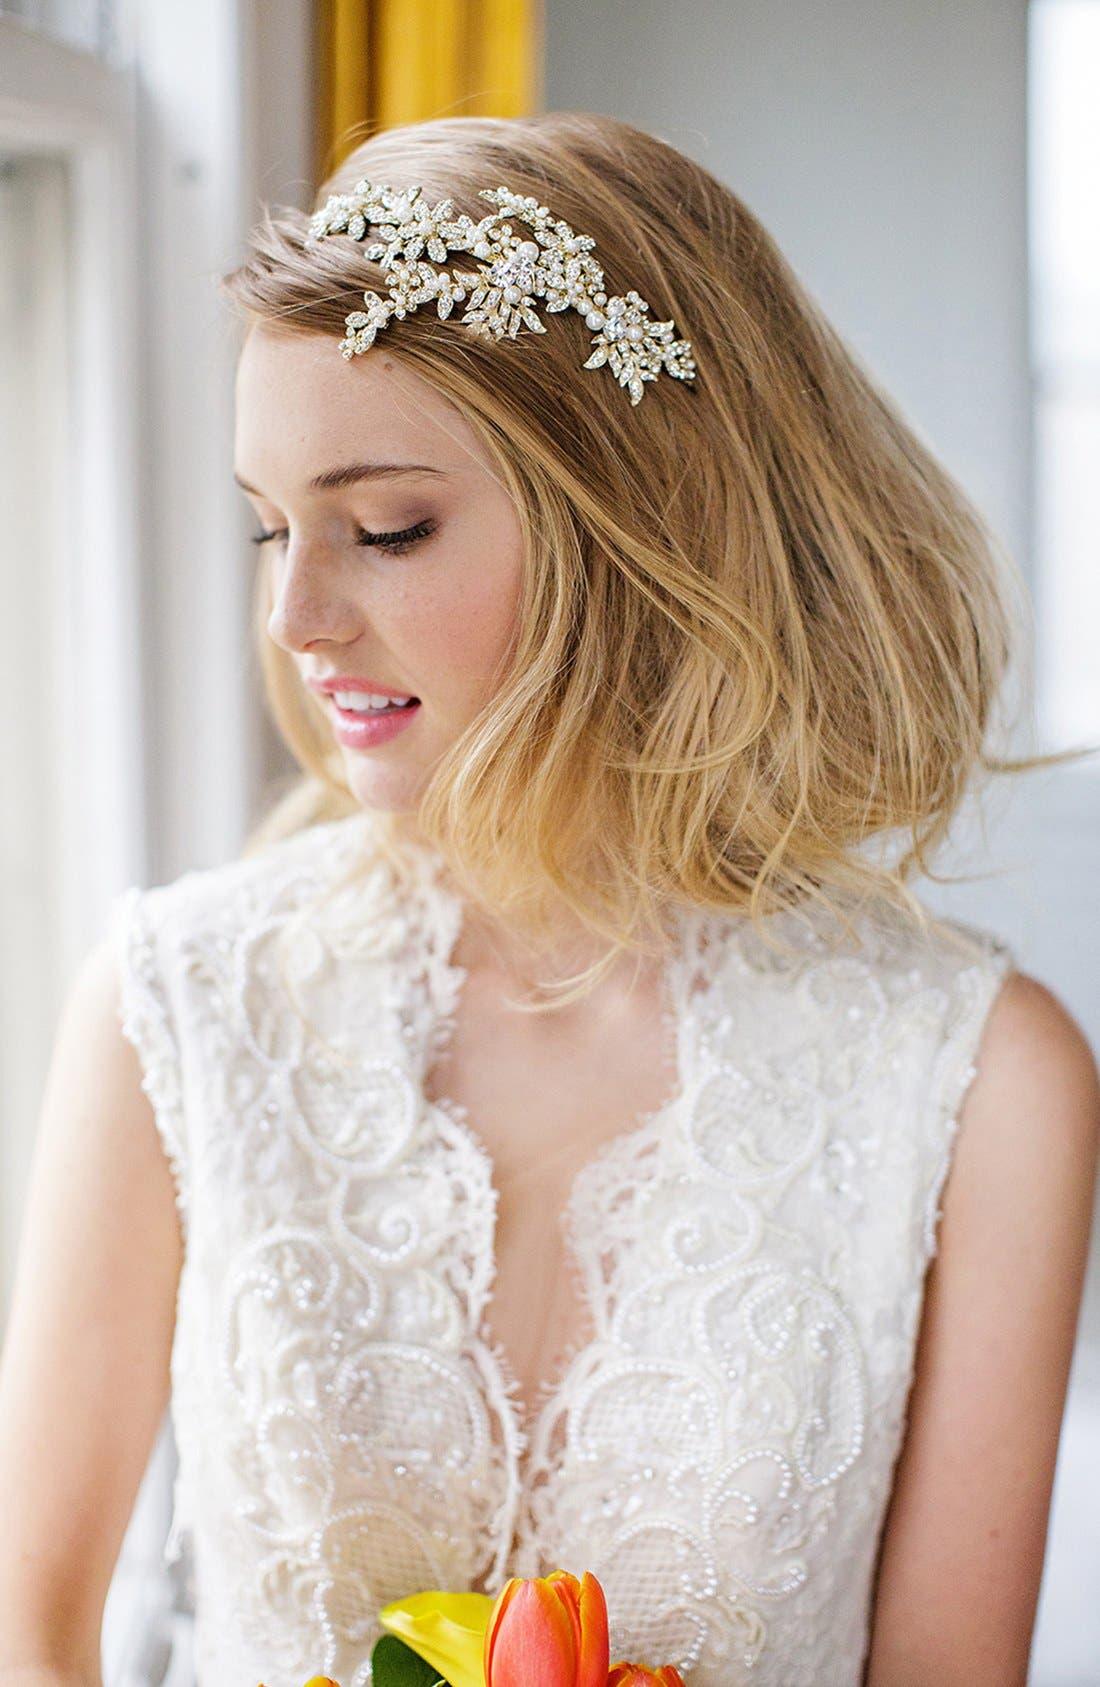 Brides & Hairpins 'Eva' Jeweled Head Band